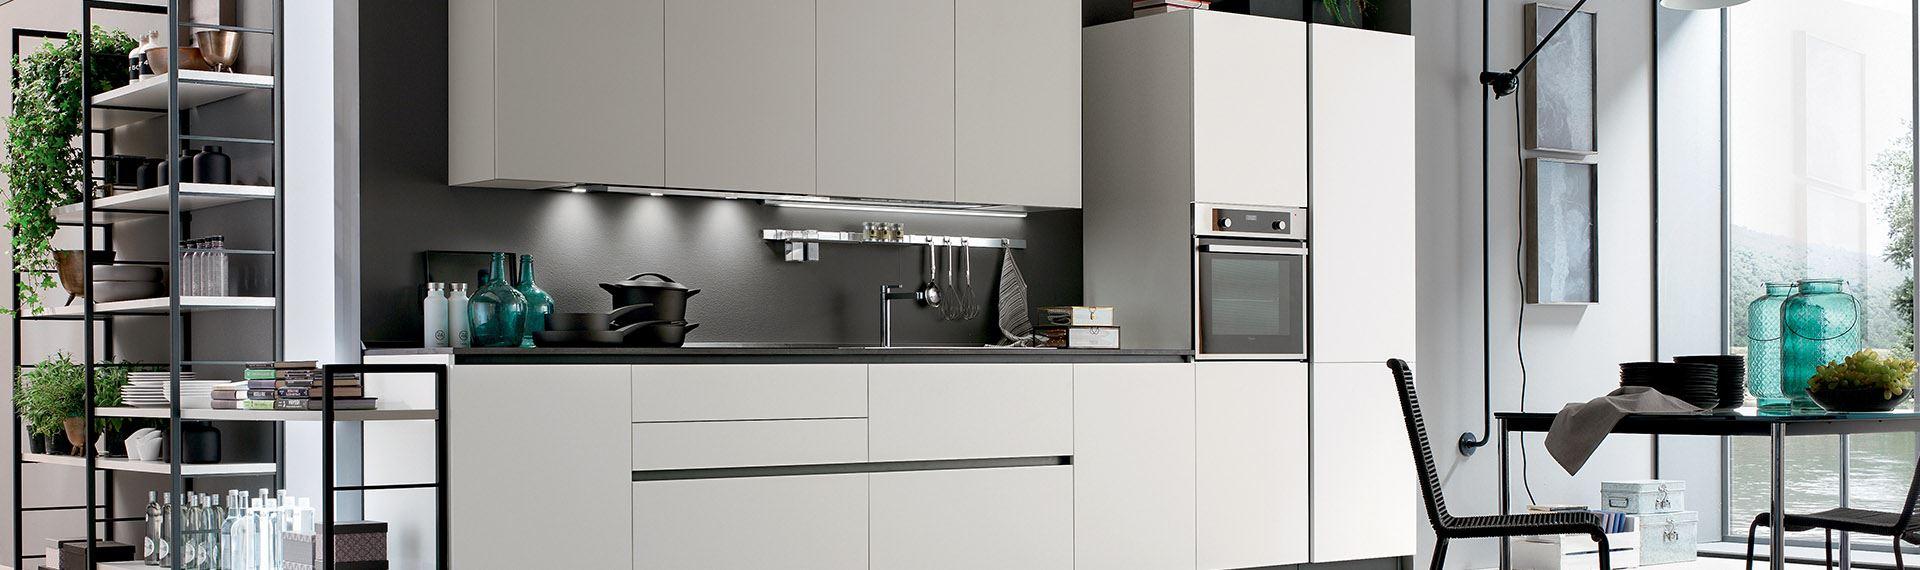 Cucine Lineari Moderne Su Misura A Padova Progettazione E Offerte